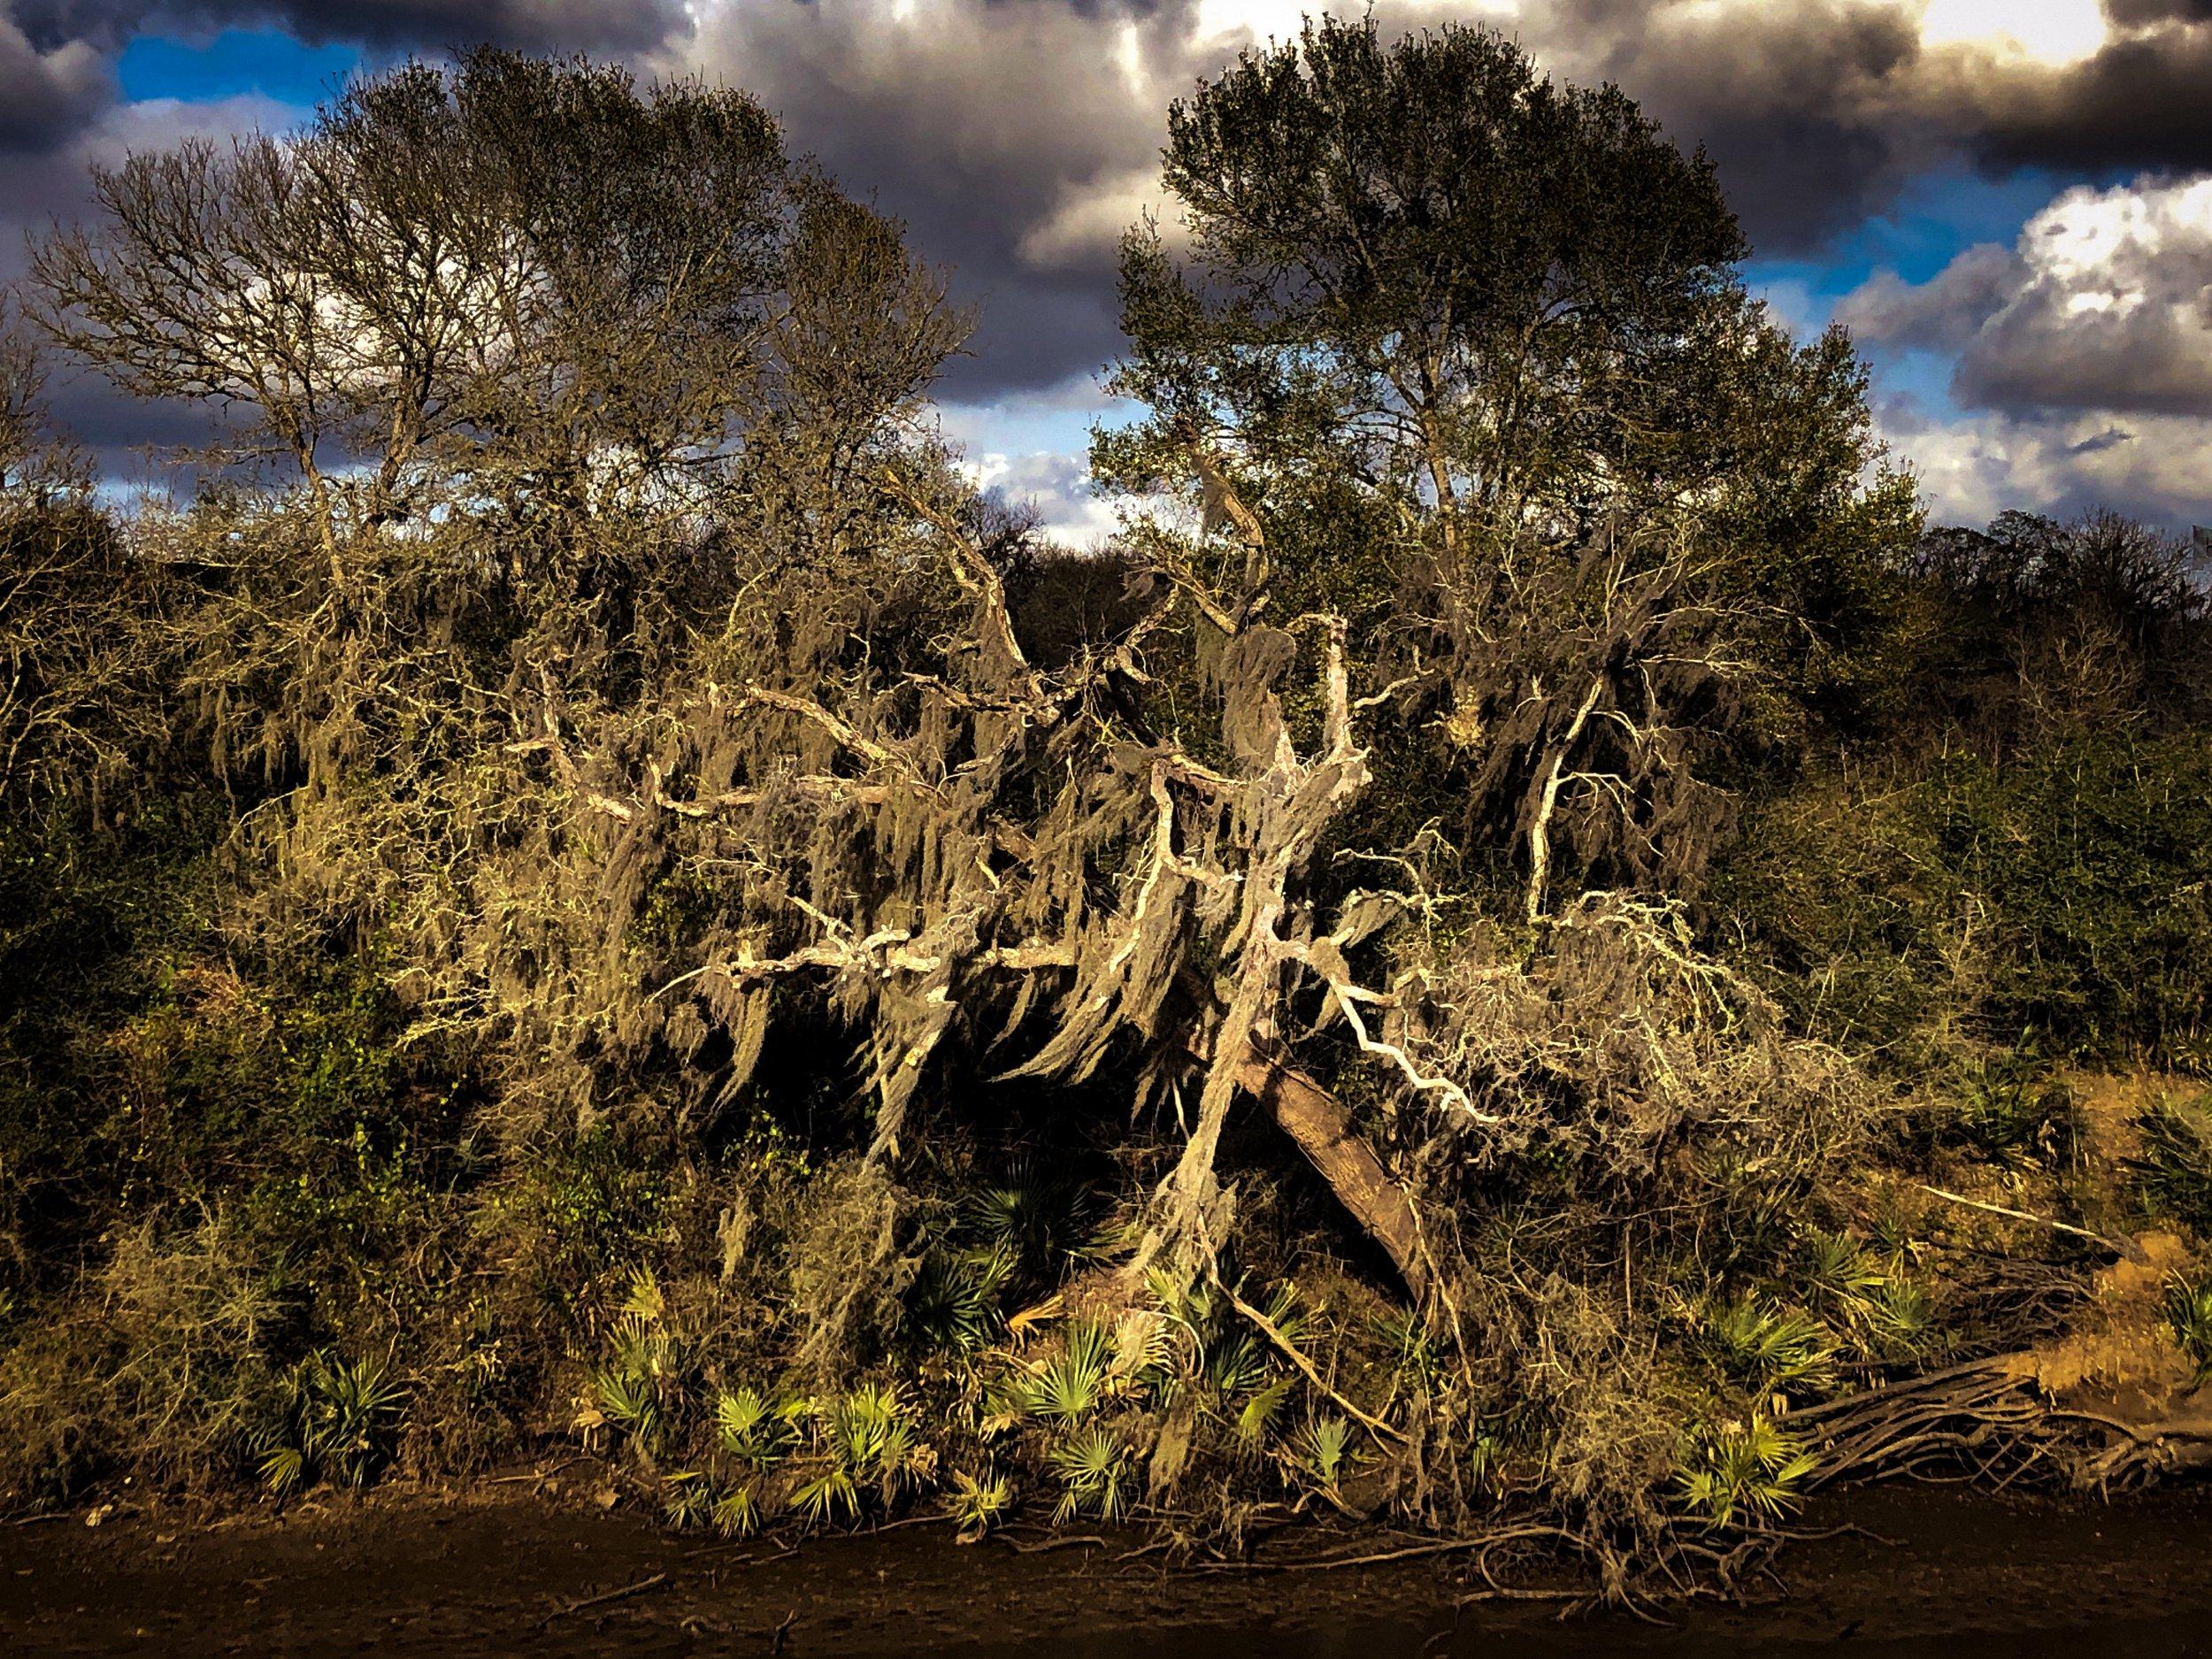 Dancing Live Oak by  Adam Graser Photography.JPG